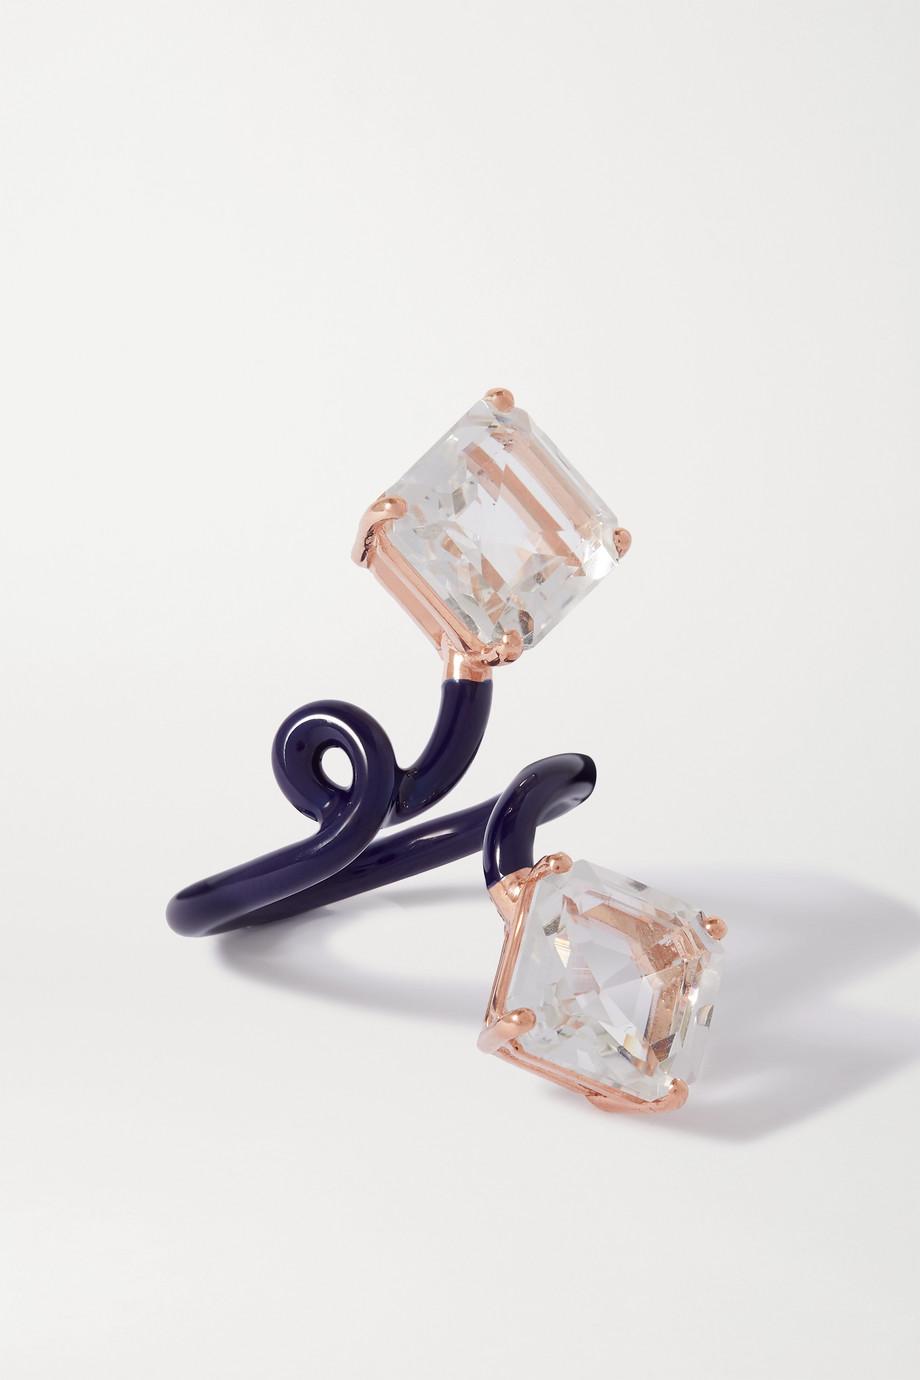 Bea Bongiasca Double Octagon Tendril 9K 玫瑰金、搪瓷、水晶戒指